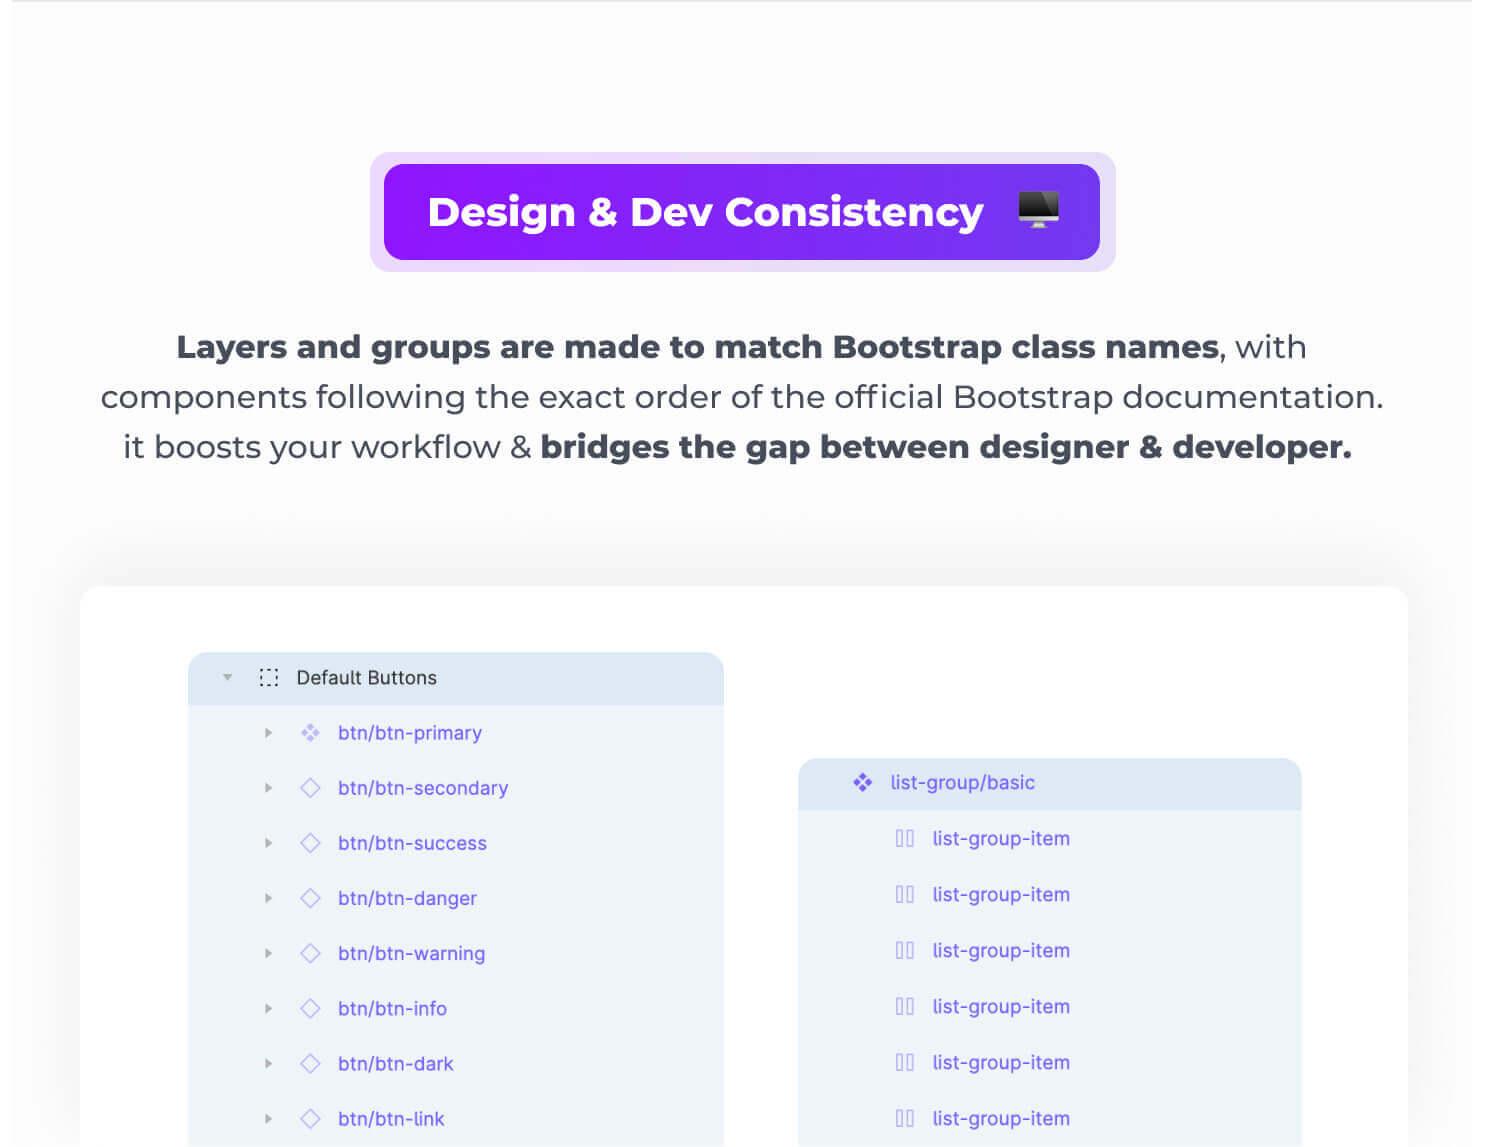 design-and-dev-consistency